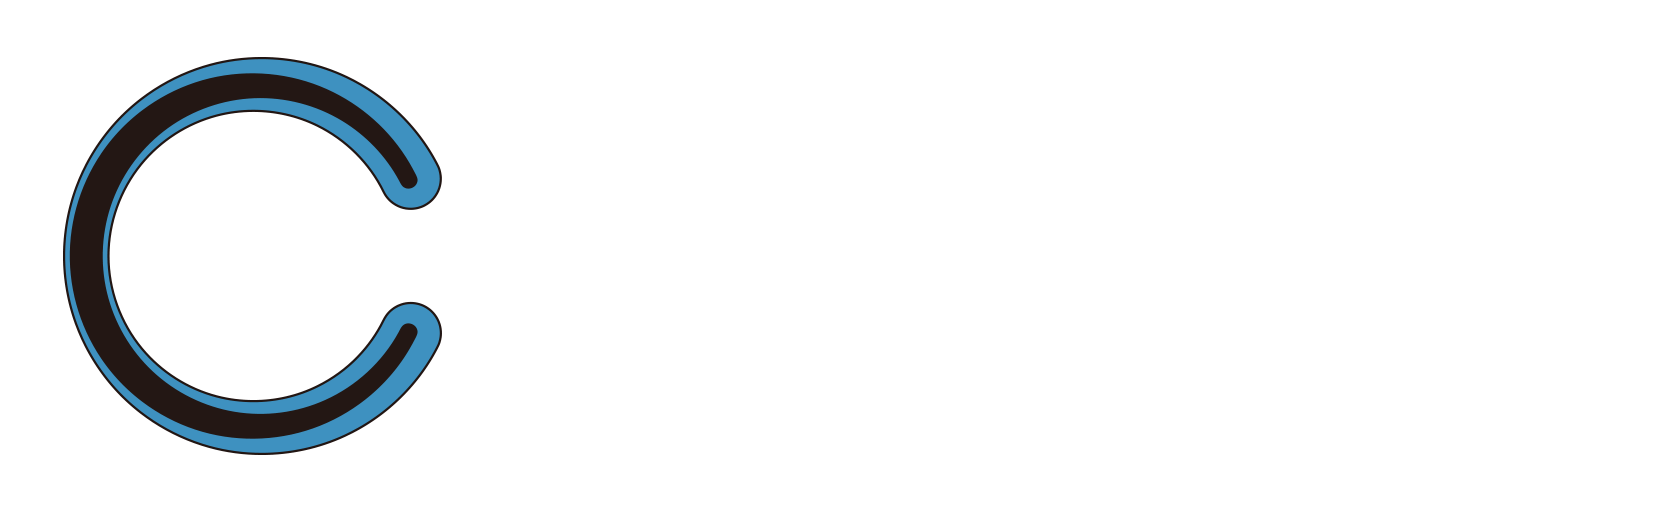 Newmake 新知造科技 CAD/CAM 專業團隊